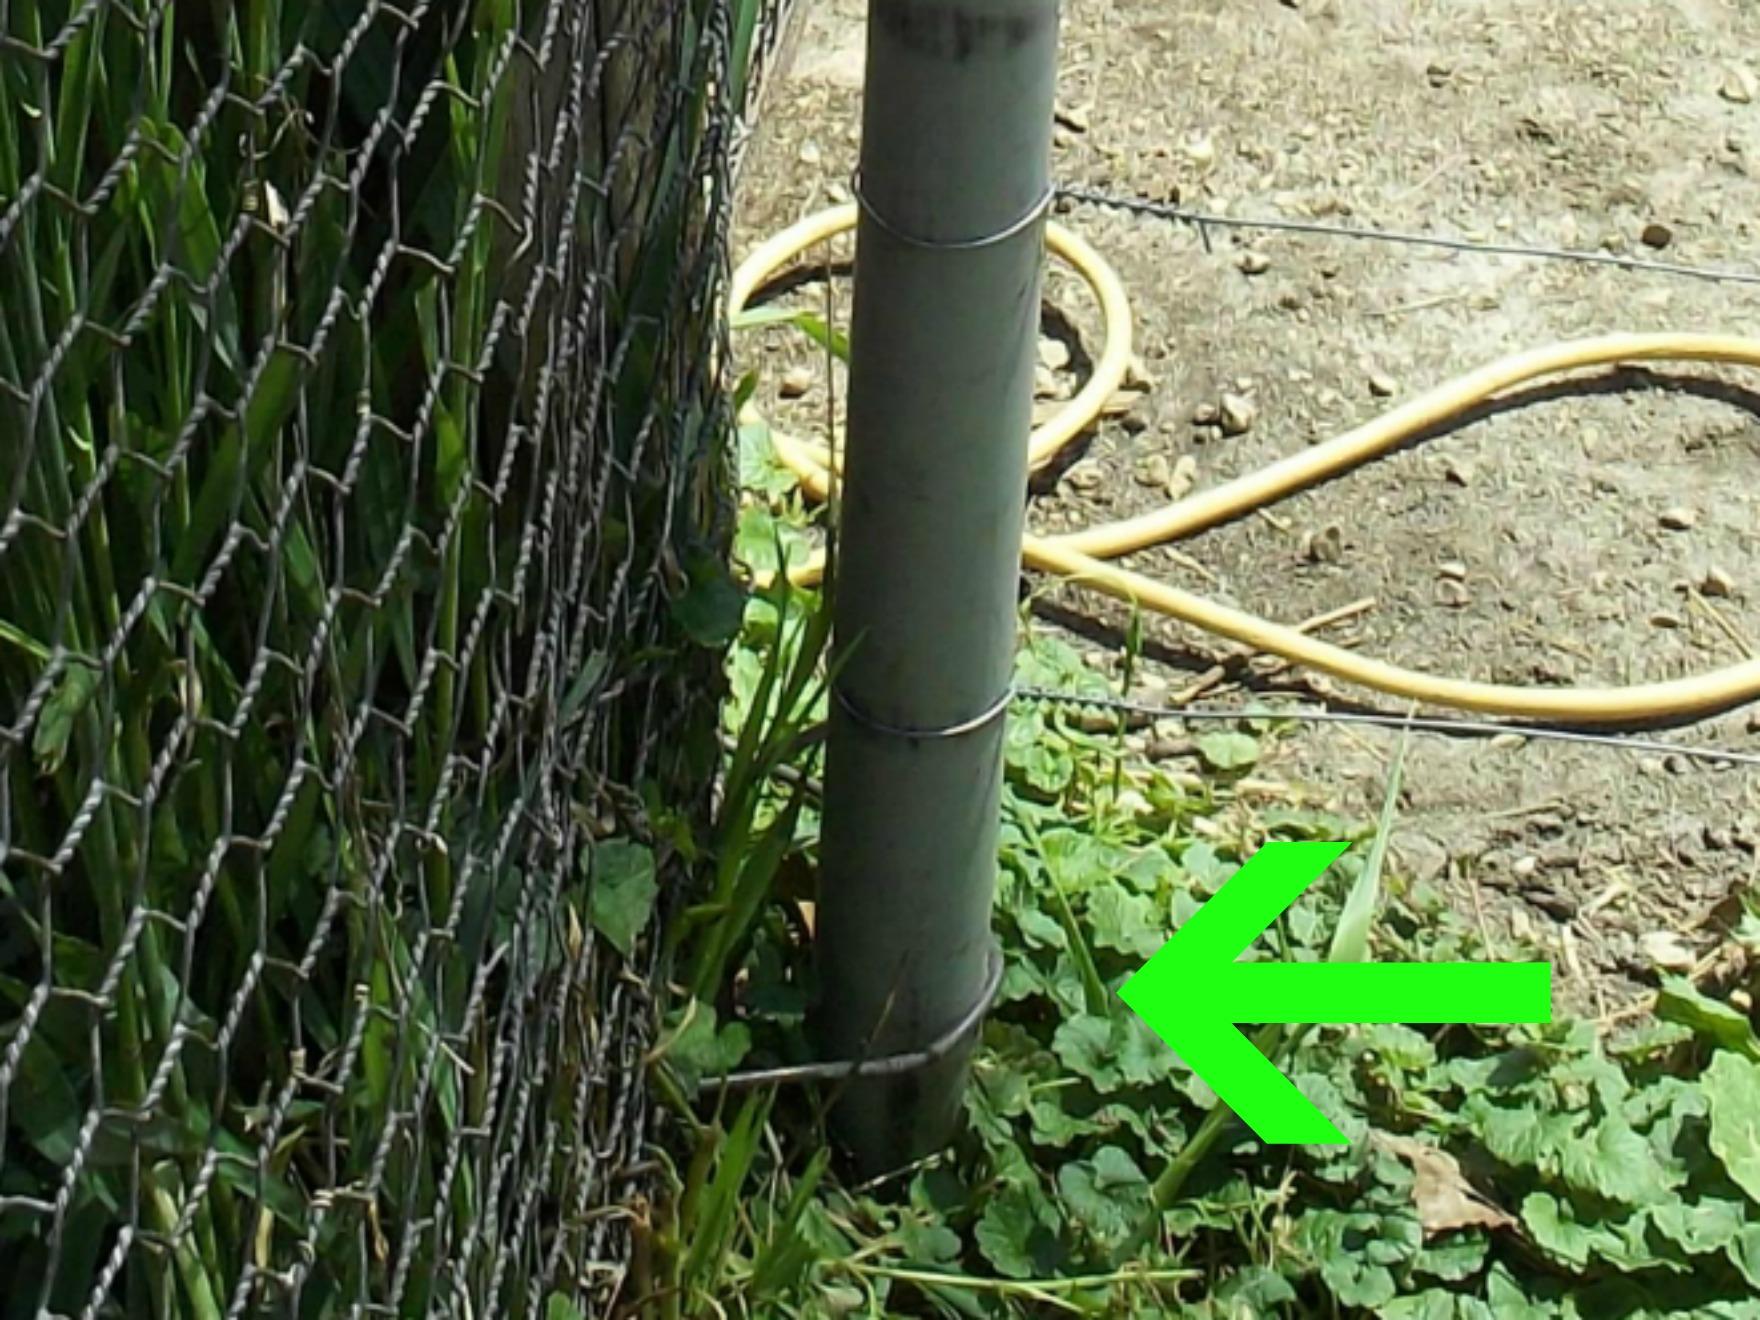 Tutorial: Handy-Dandy Fence Gates | Our Prairie Nest: A Simple Life